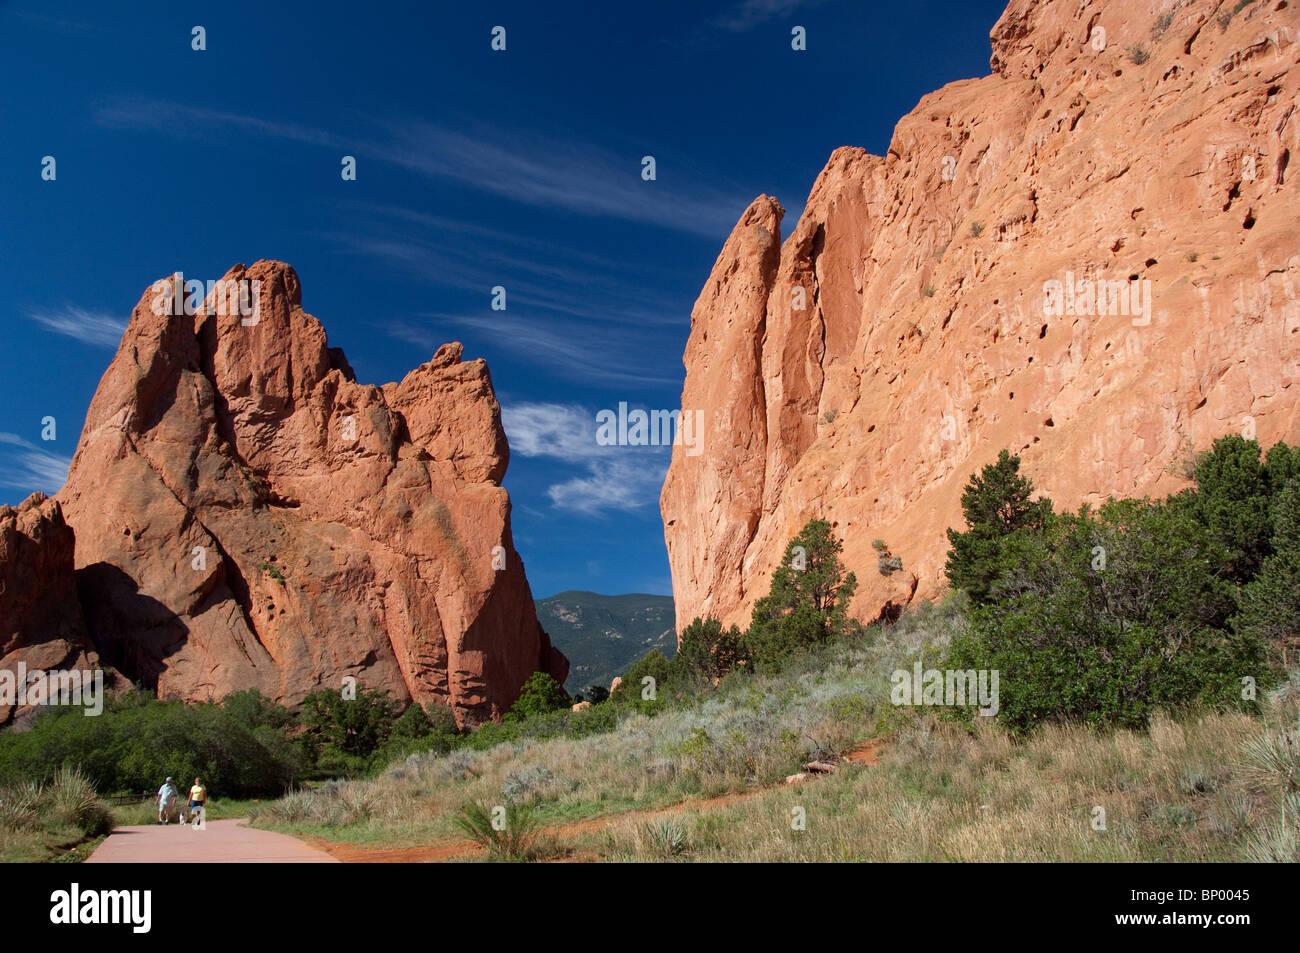 USA, Colorado, Colorado Springs, Garden of the Gods Natural Monument & park. - Stock Image